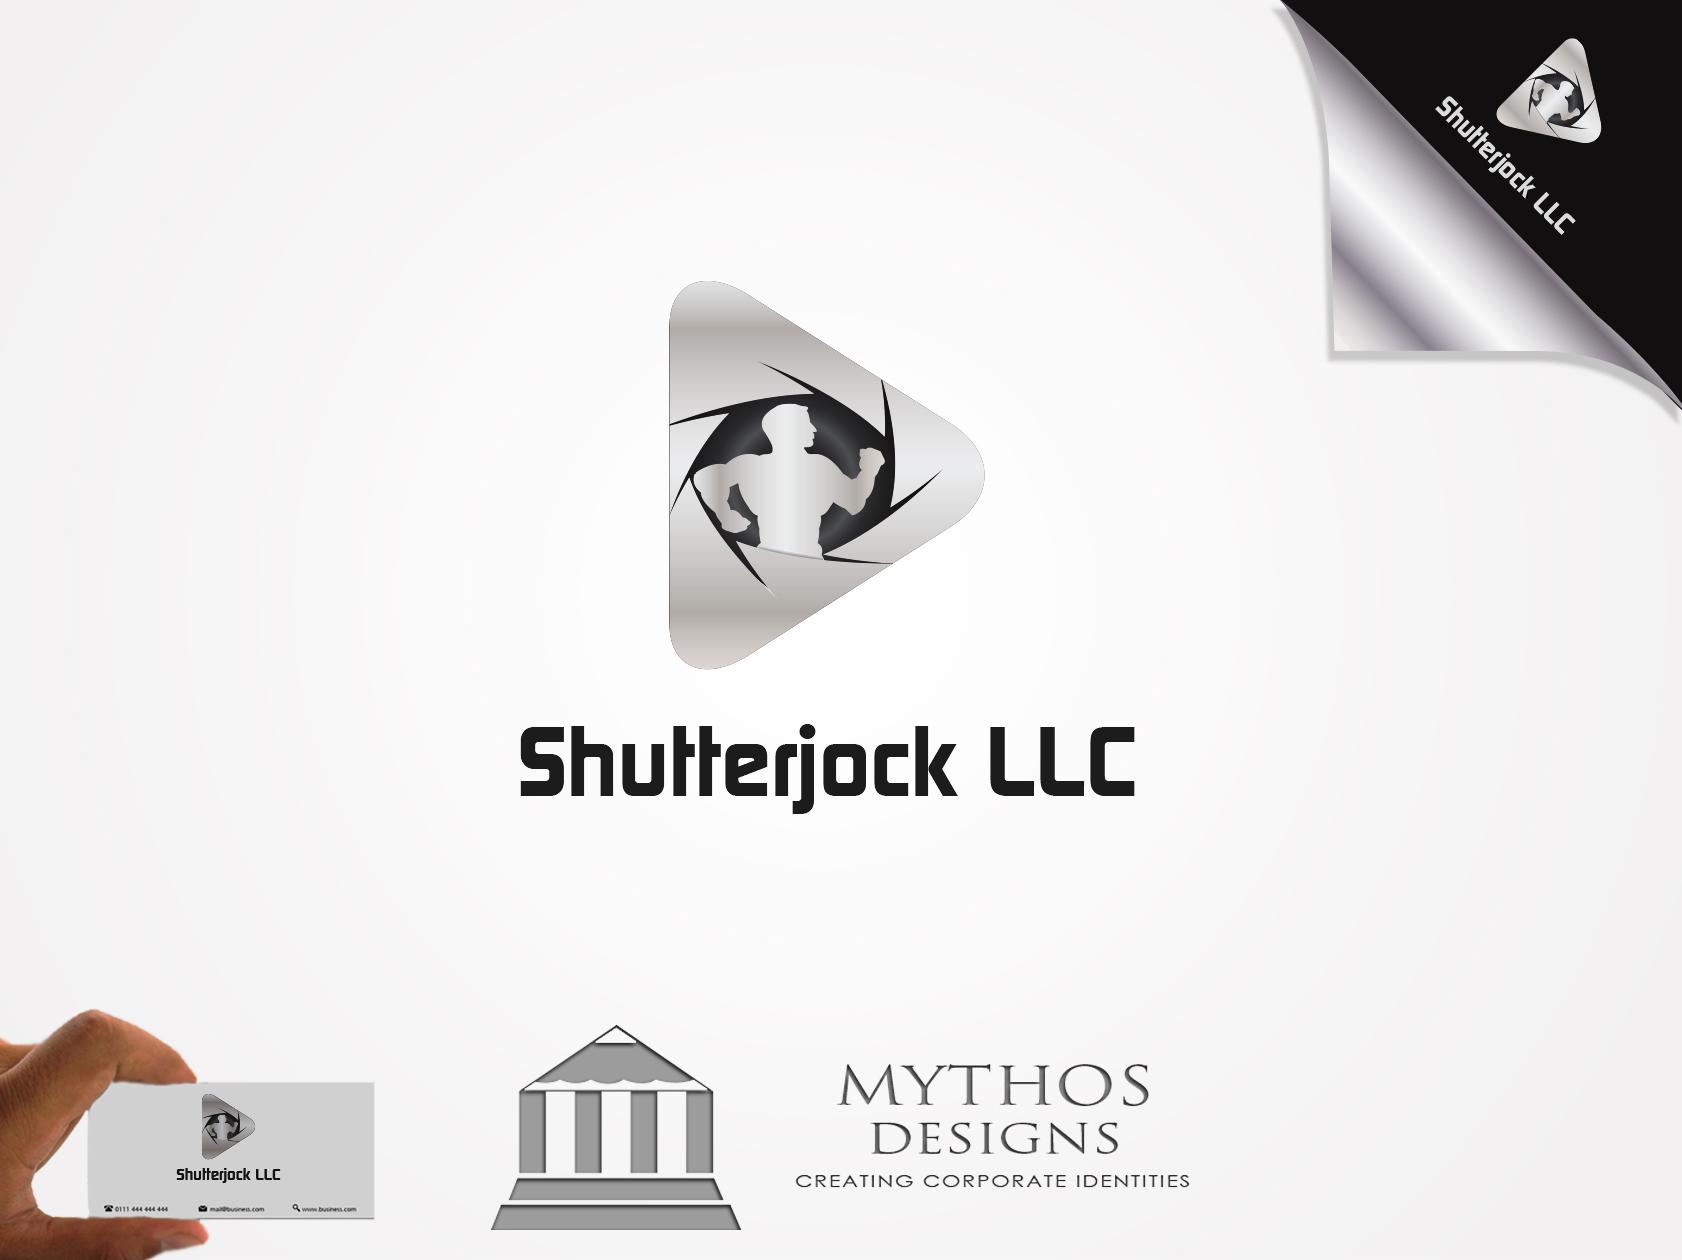 Logo Design by Mythos Designs - Entry No. 92 in the Logo Design Contest Unique Logo Design Wanted for Shutterjock LLC.